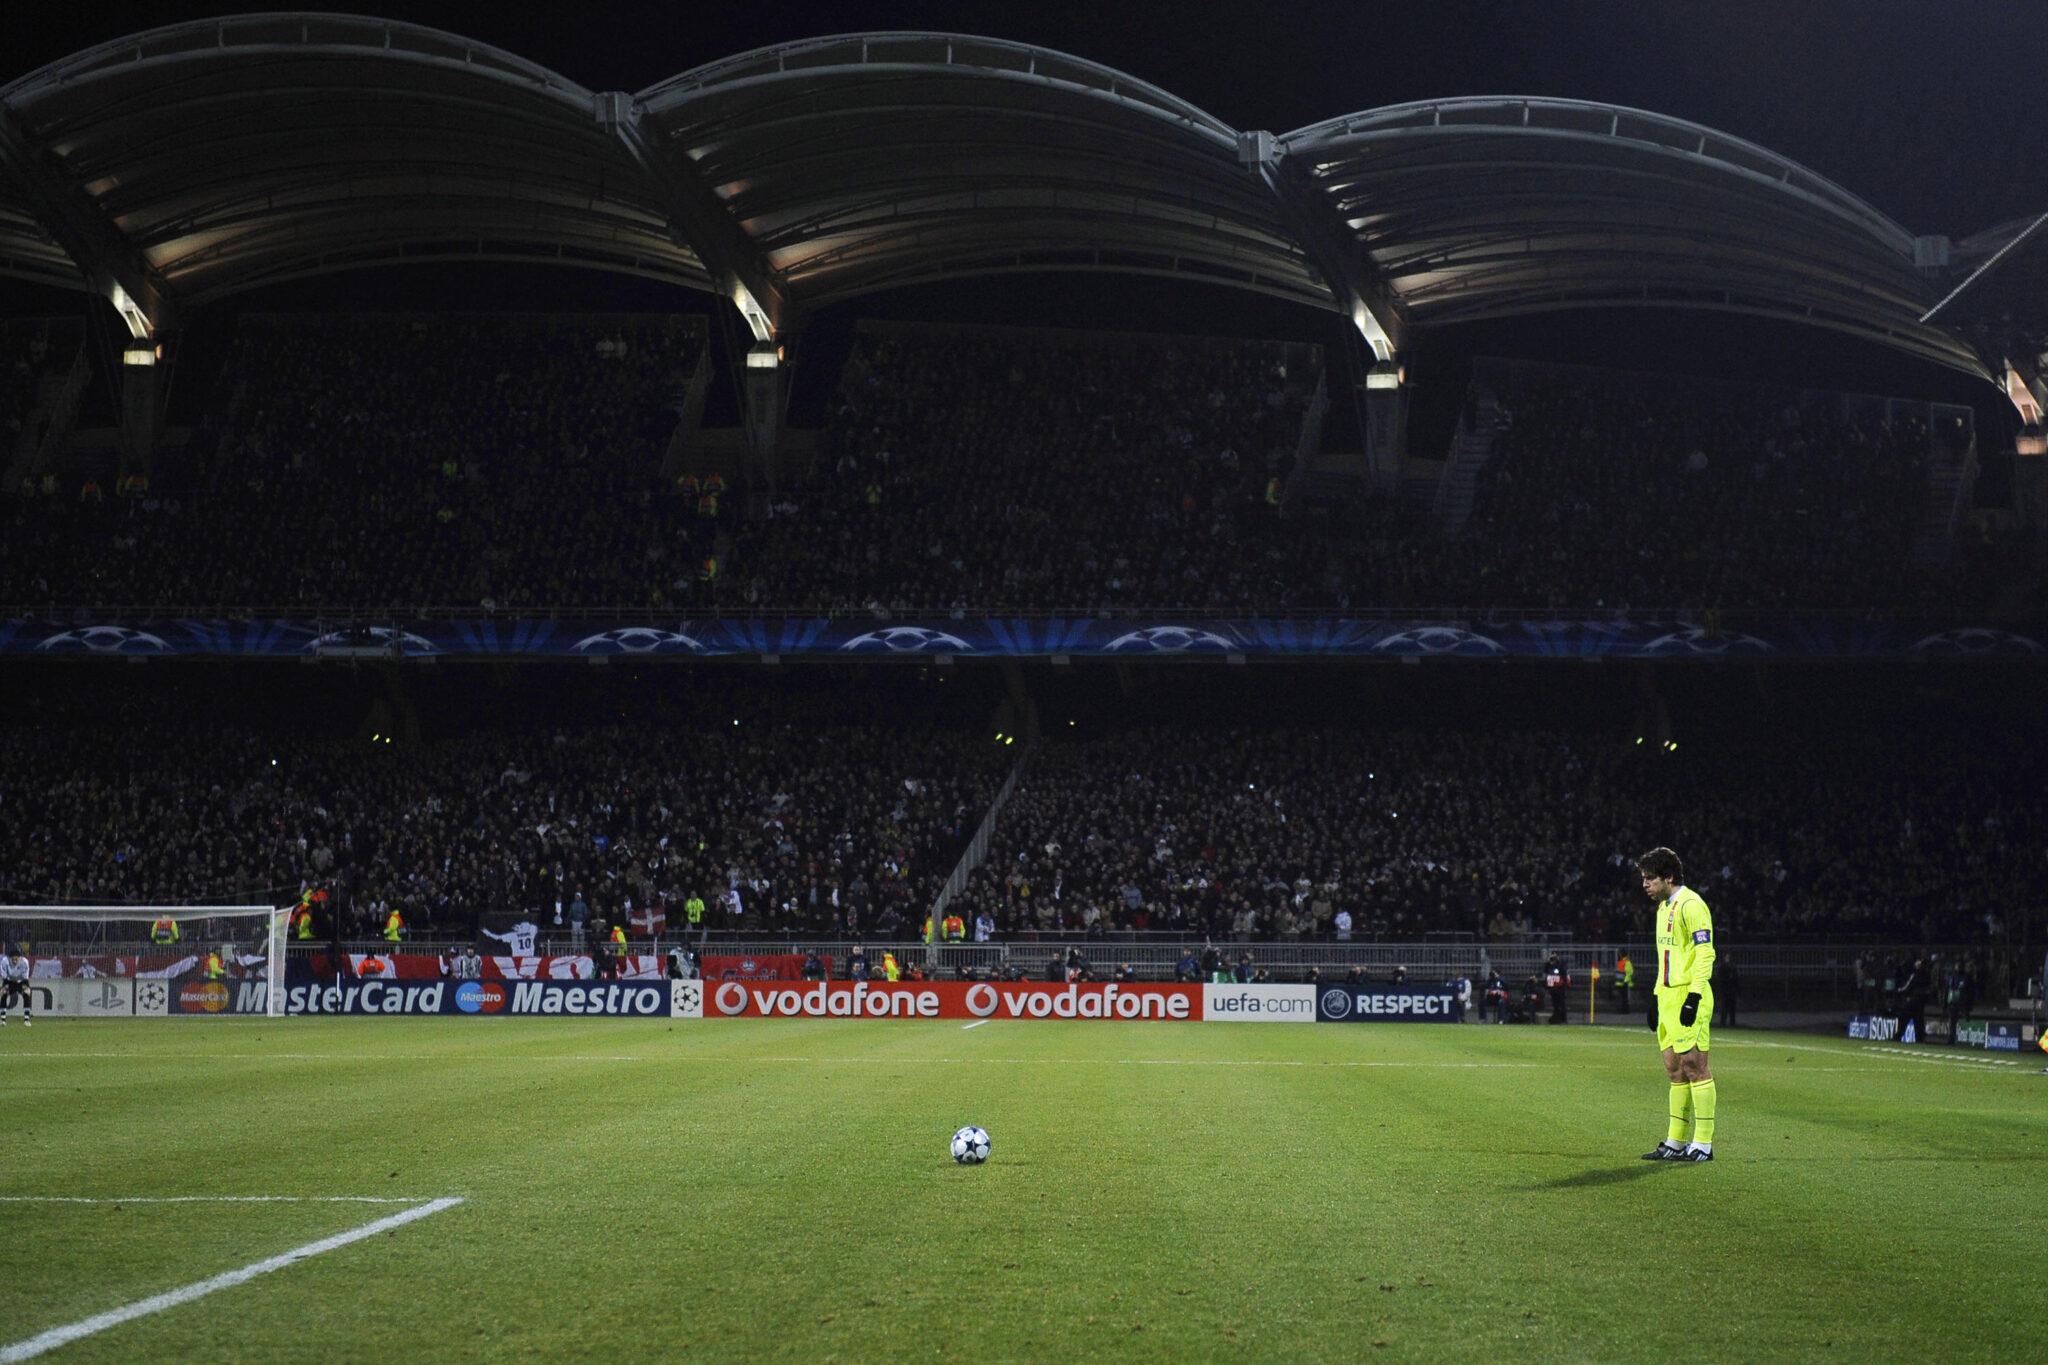 Juninho vs Barcellona - Foto Fred Dufour AFP via Getty Images OneFootball